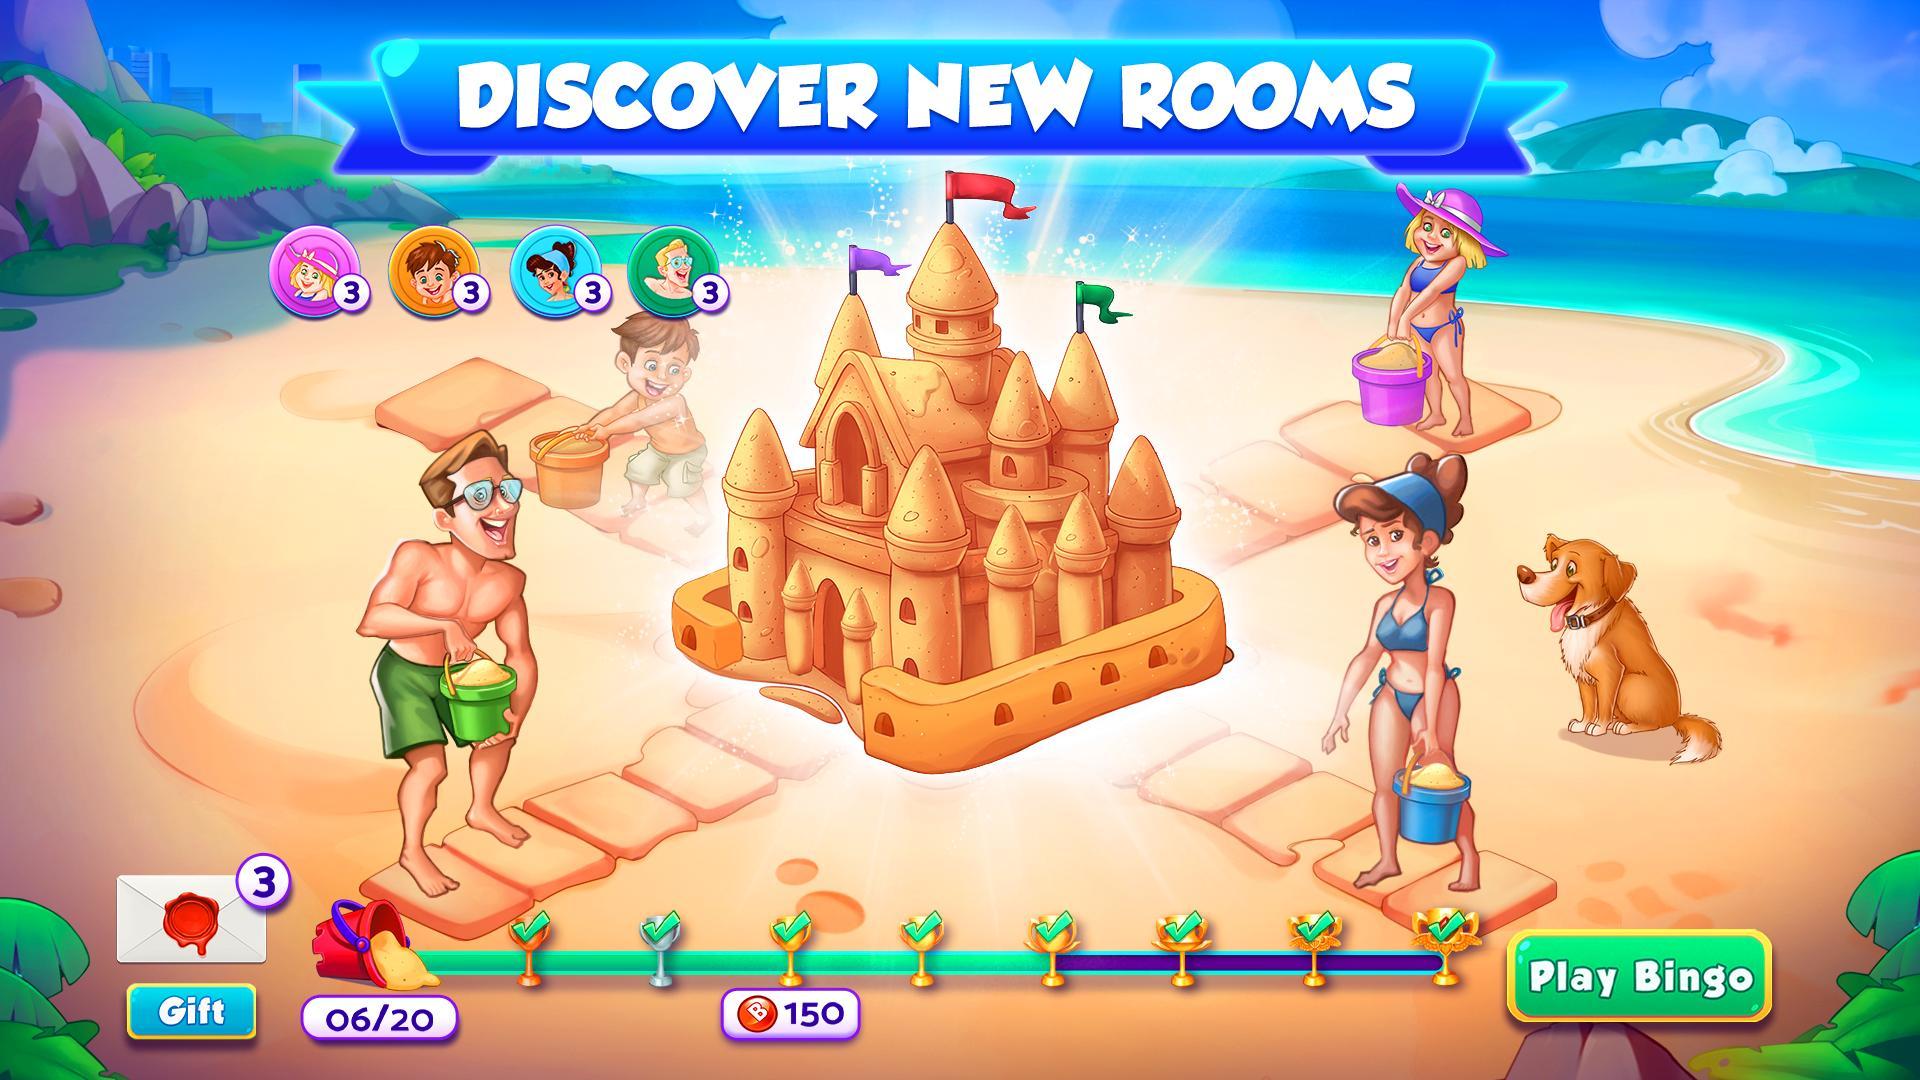 Bingo Bash Live Bingo Games & Free Slots By GSN 1.158.1 Screenshot 3